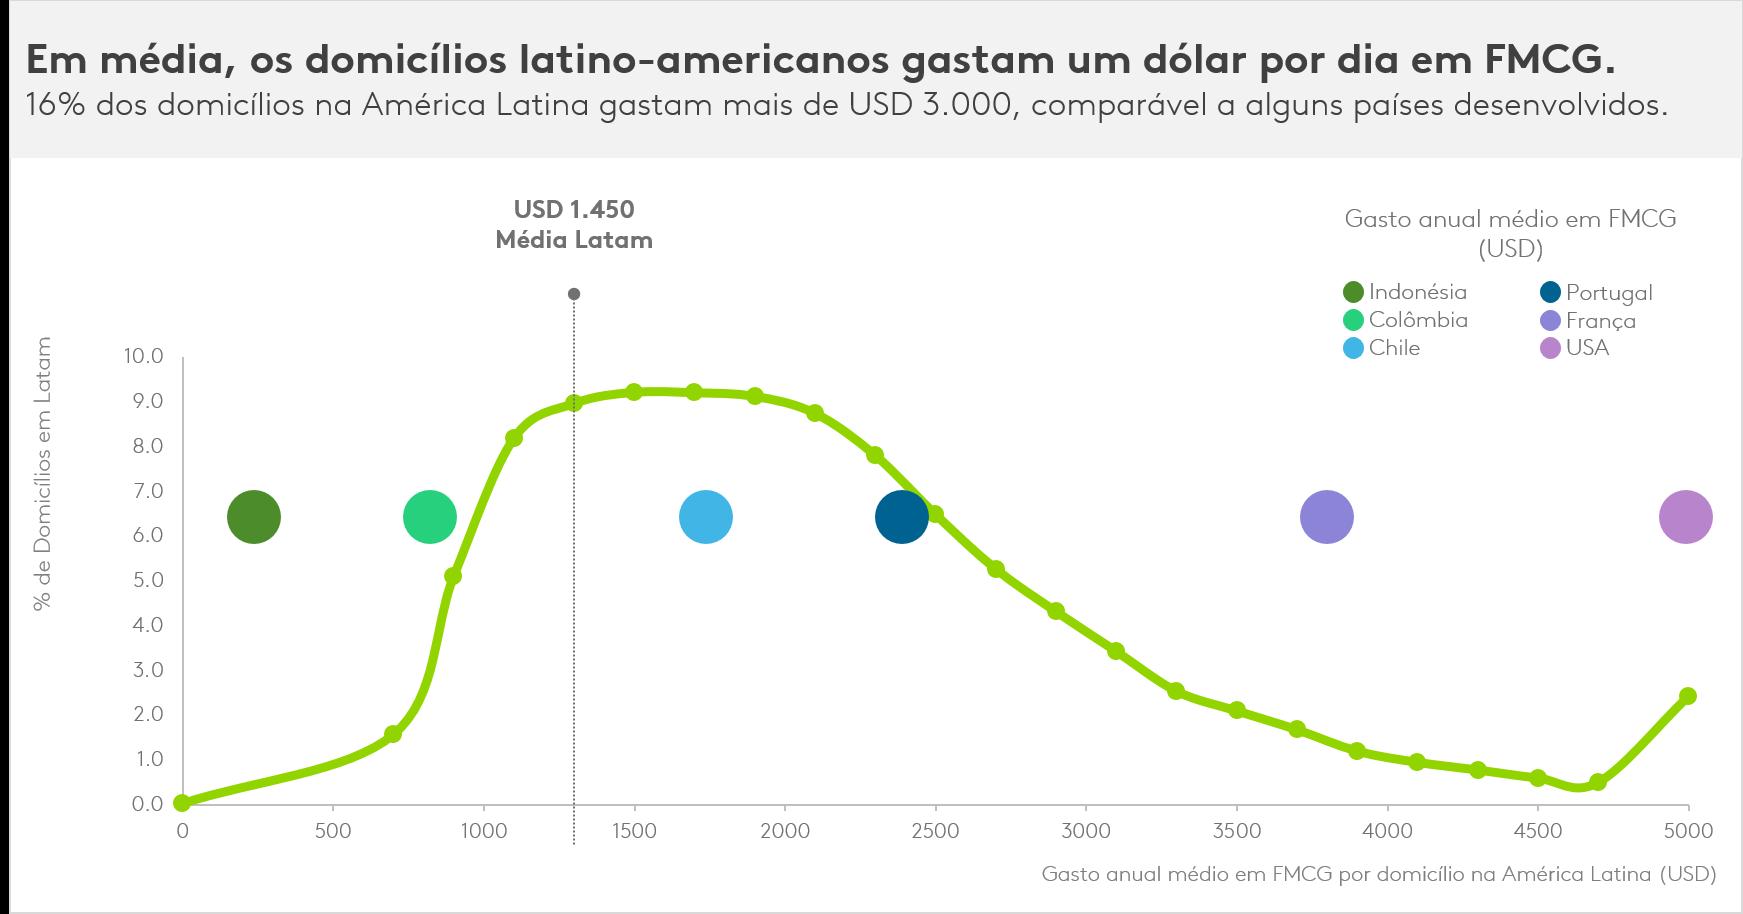 Grafico3.png